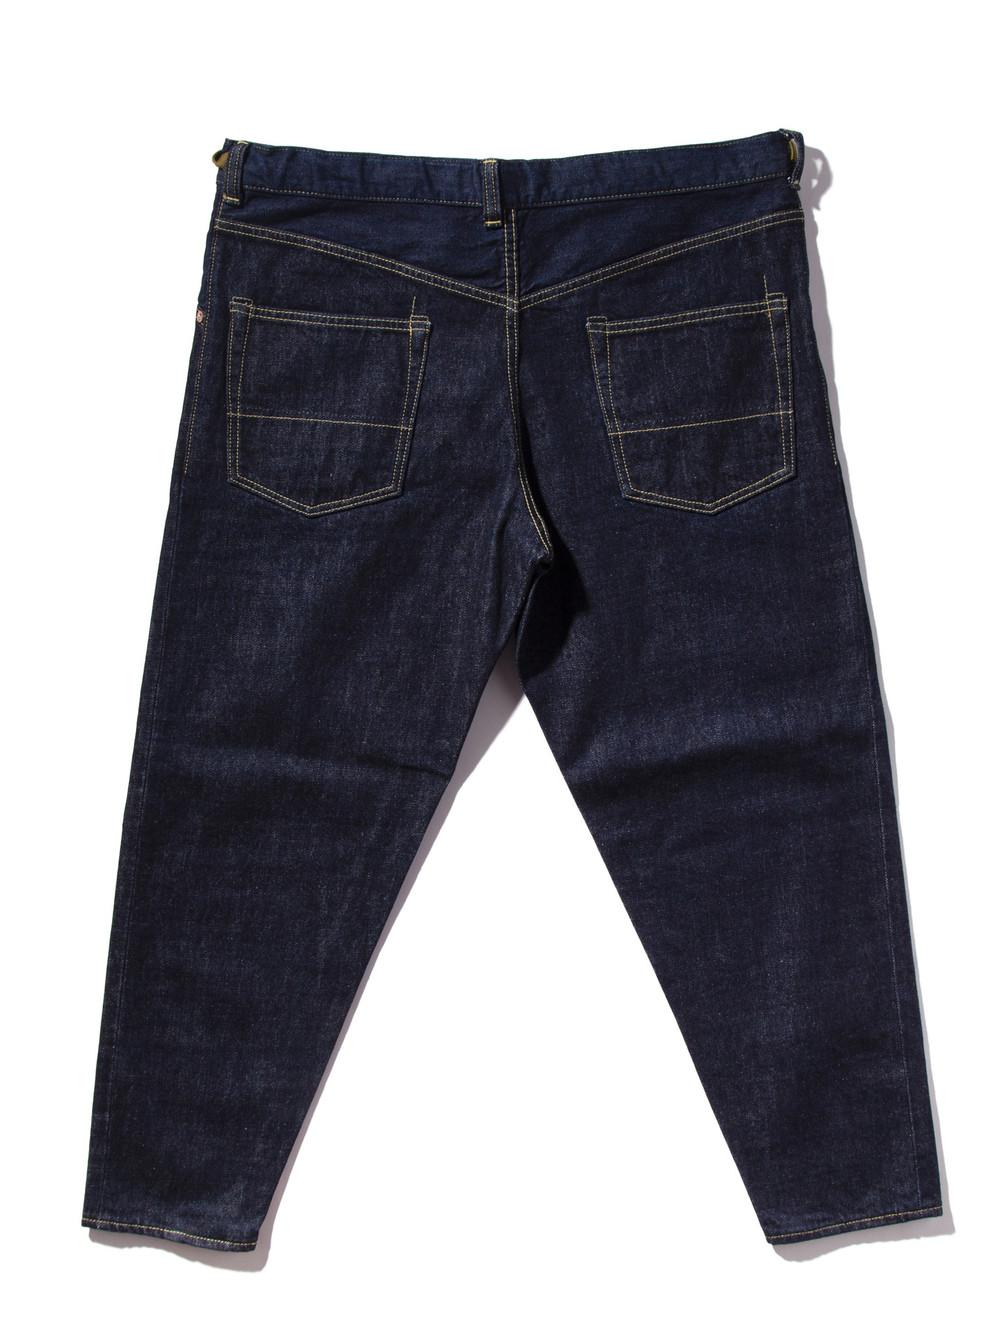 GANRYU_Slouch_Denim_Jeans-2.jpg